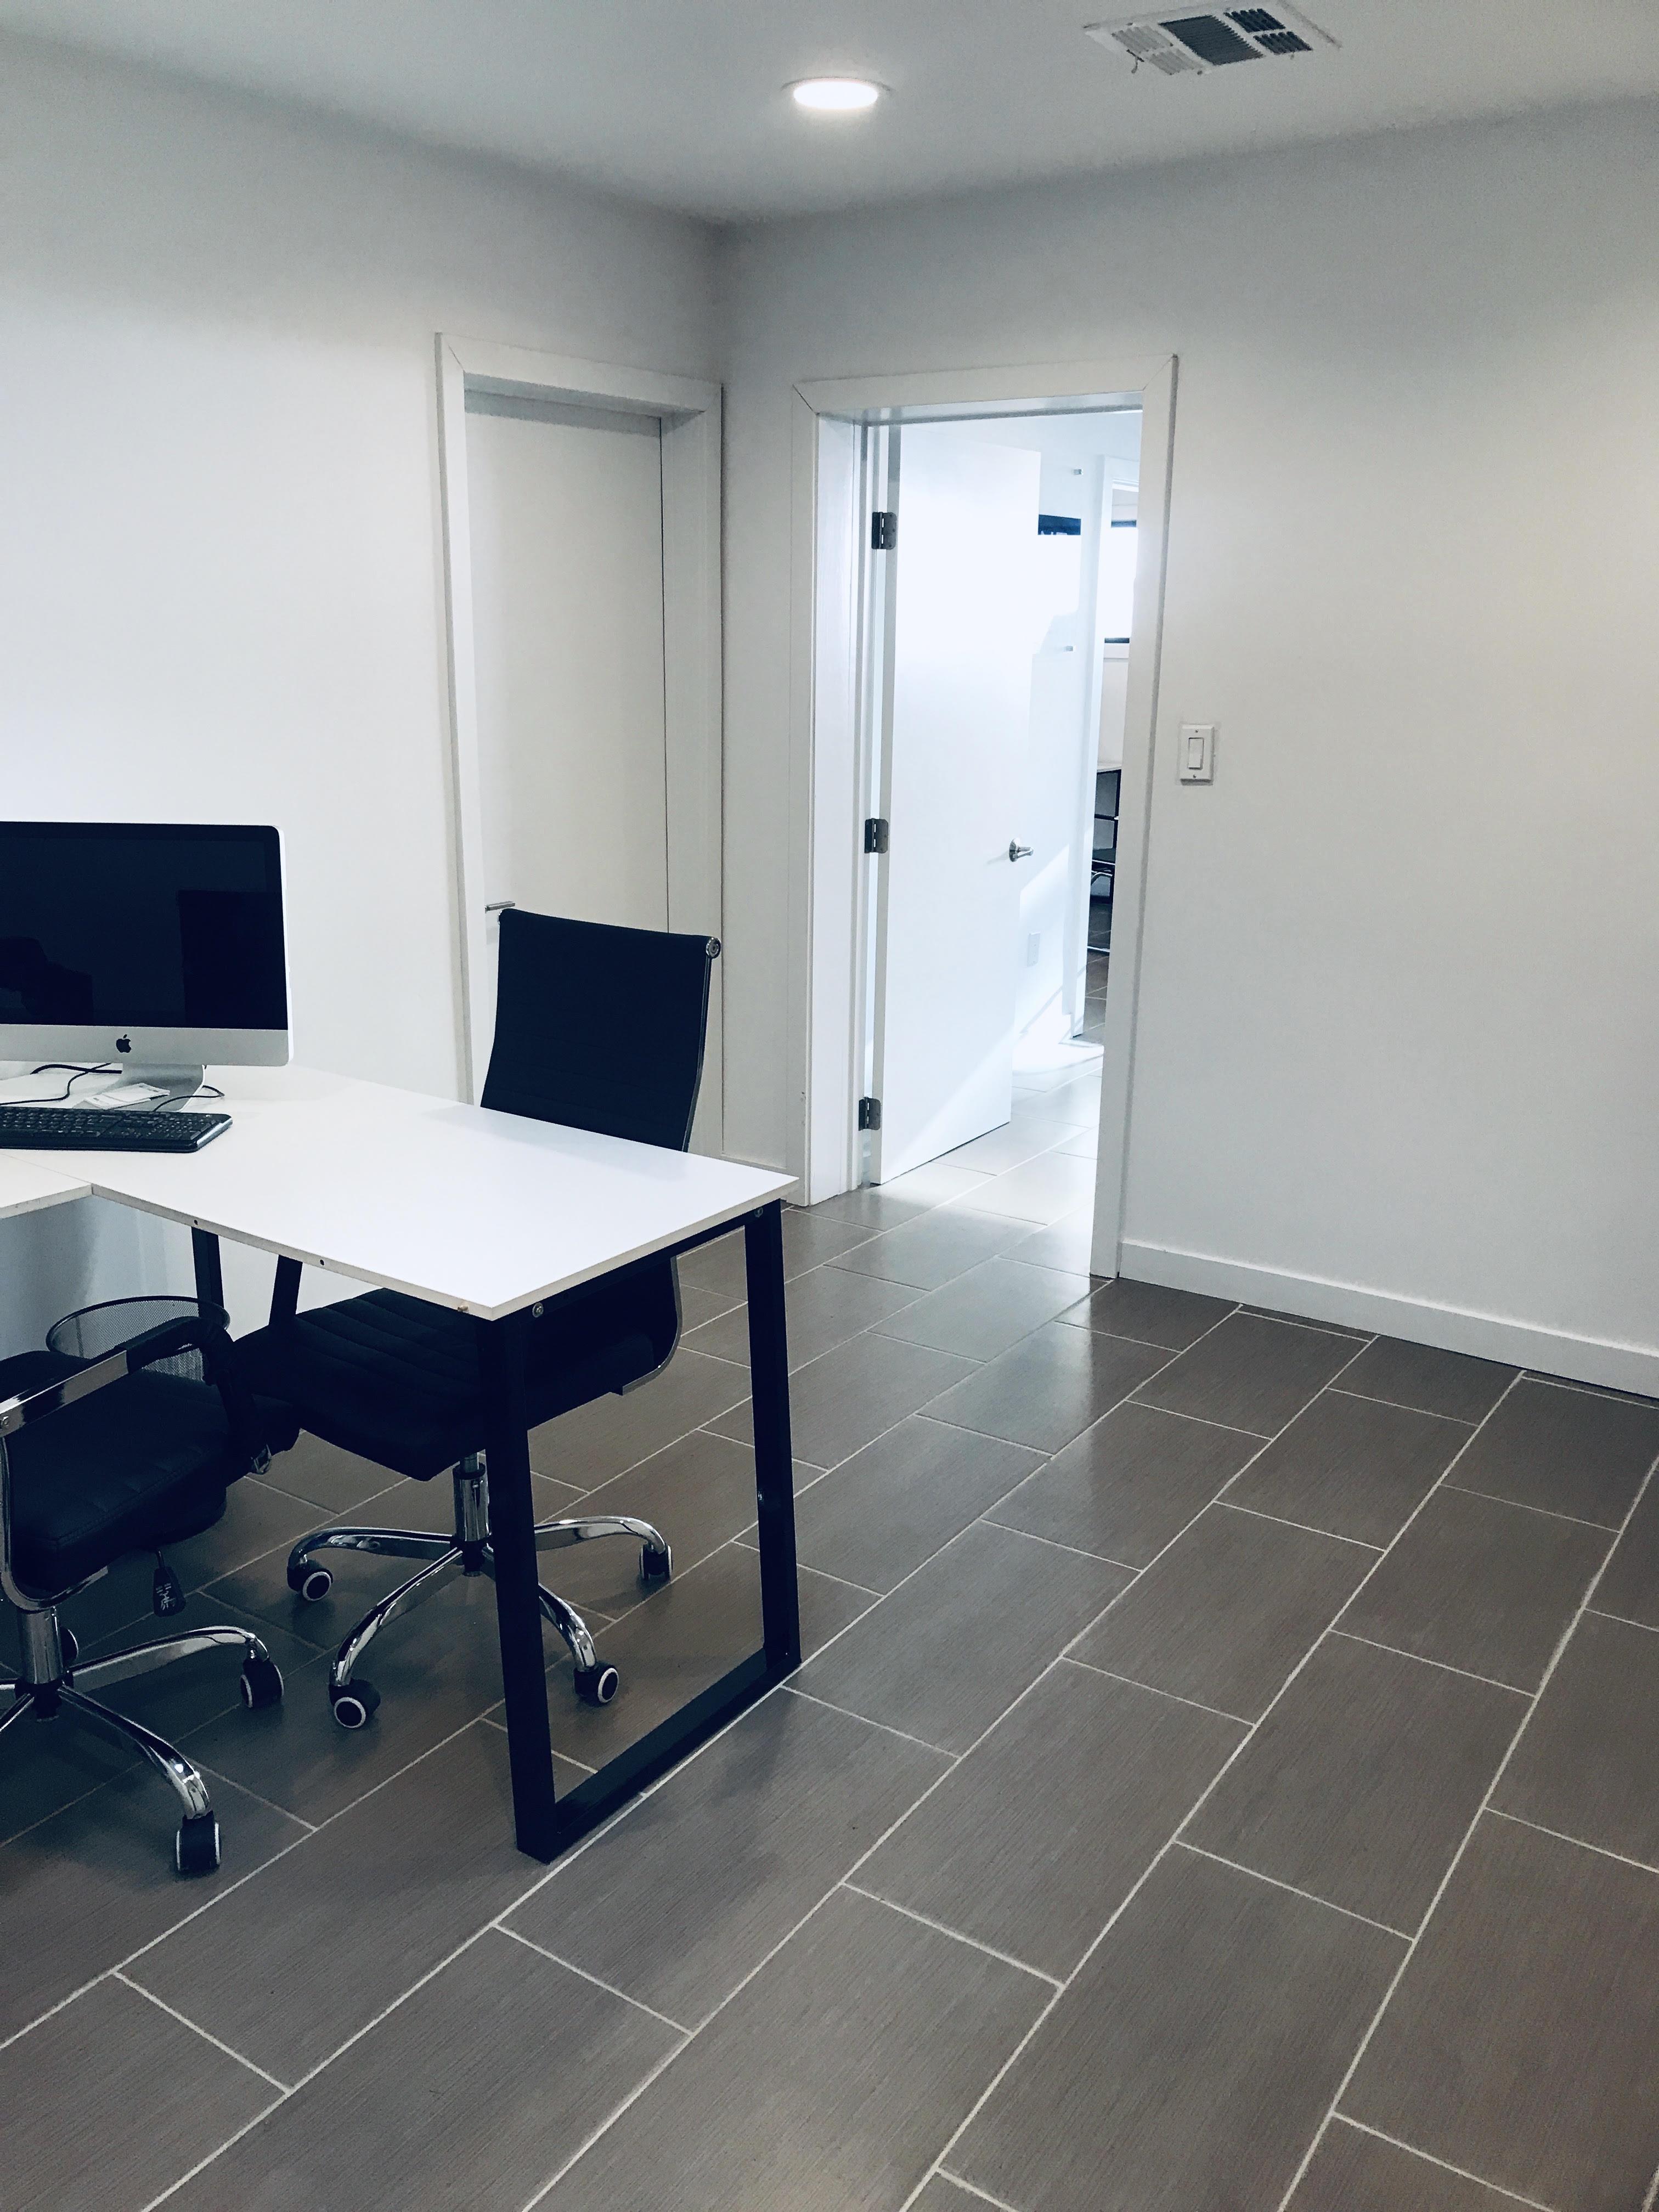 Bidlane - Office 1